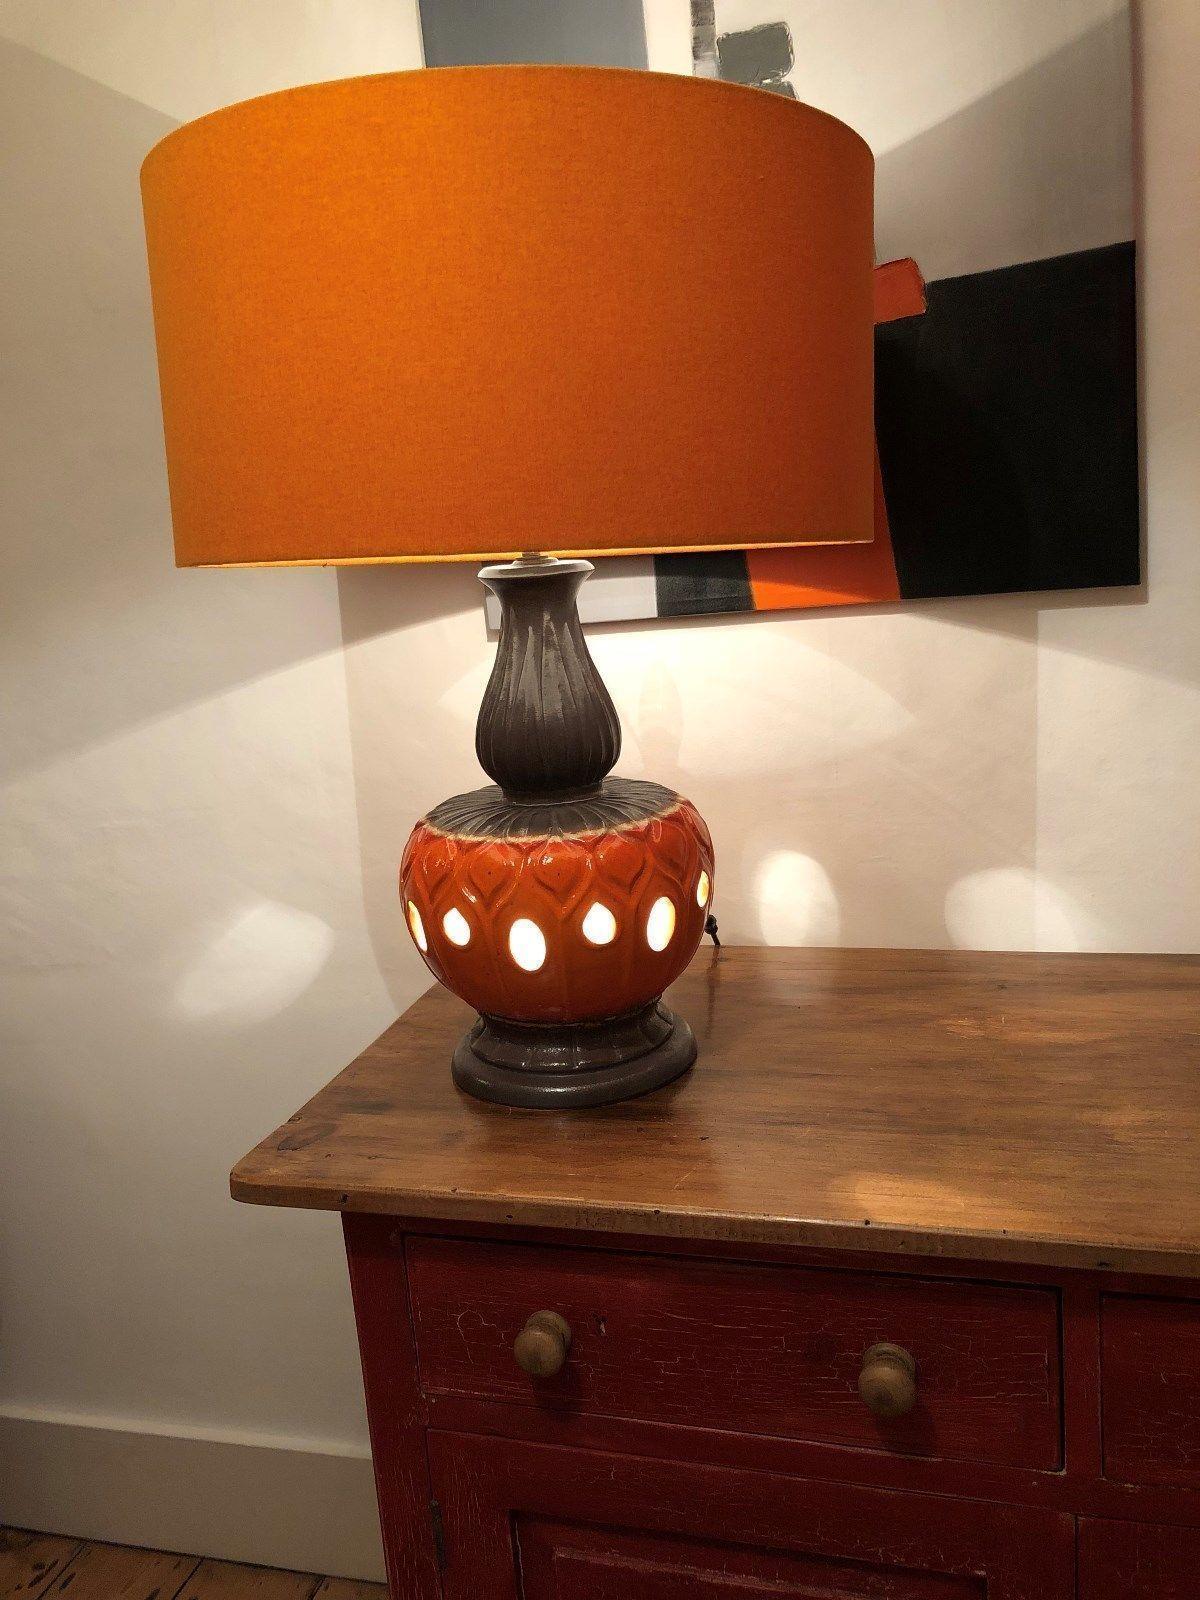 Vintage Table Lamp Base Art Pottery Striking Design Orange Brown Circa 1960s Vgc